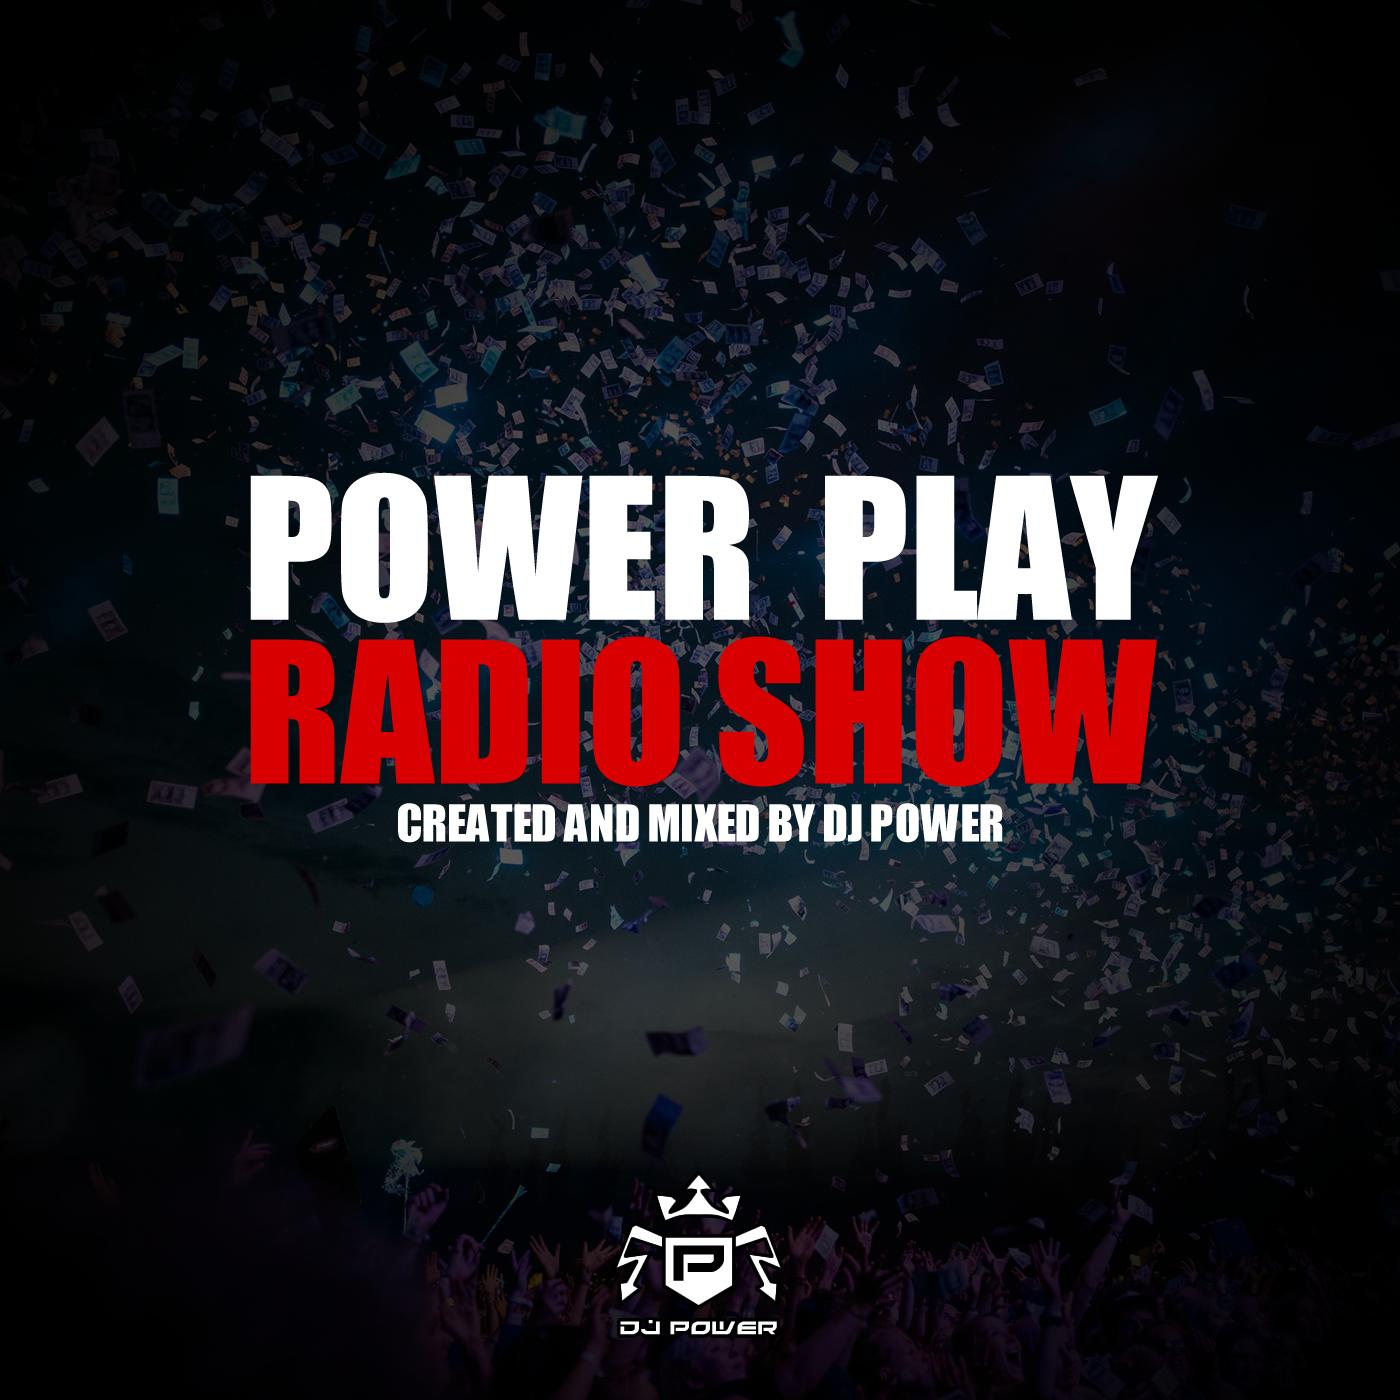 DJ POWER - POWER PLAY RADIO SHOW